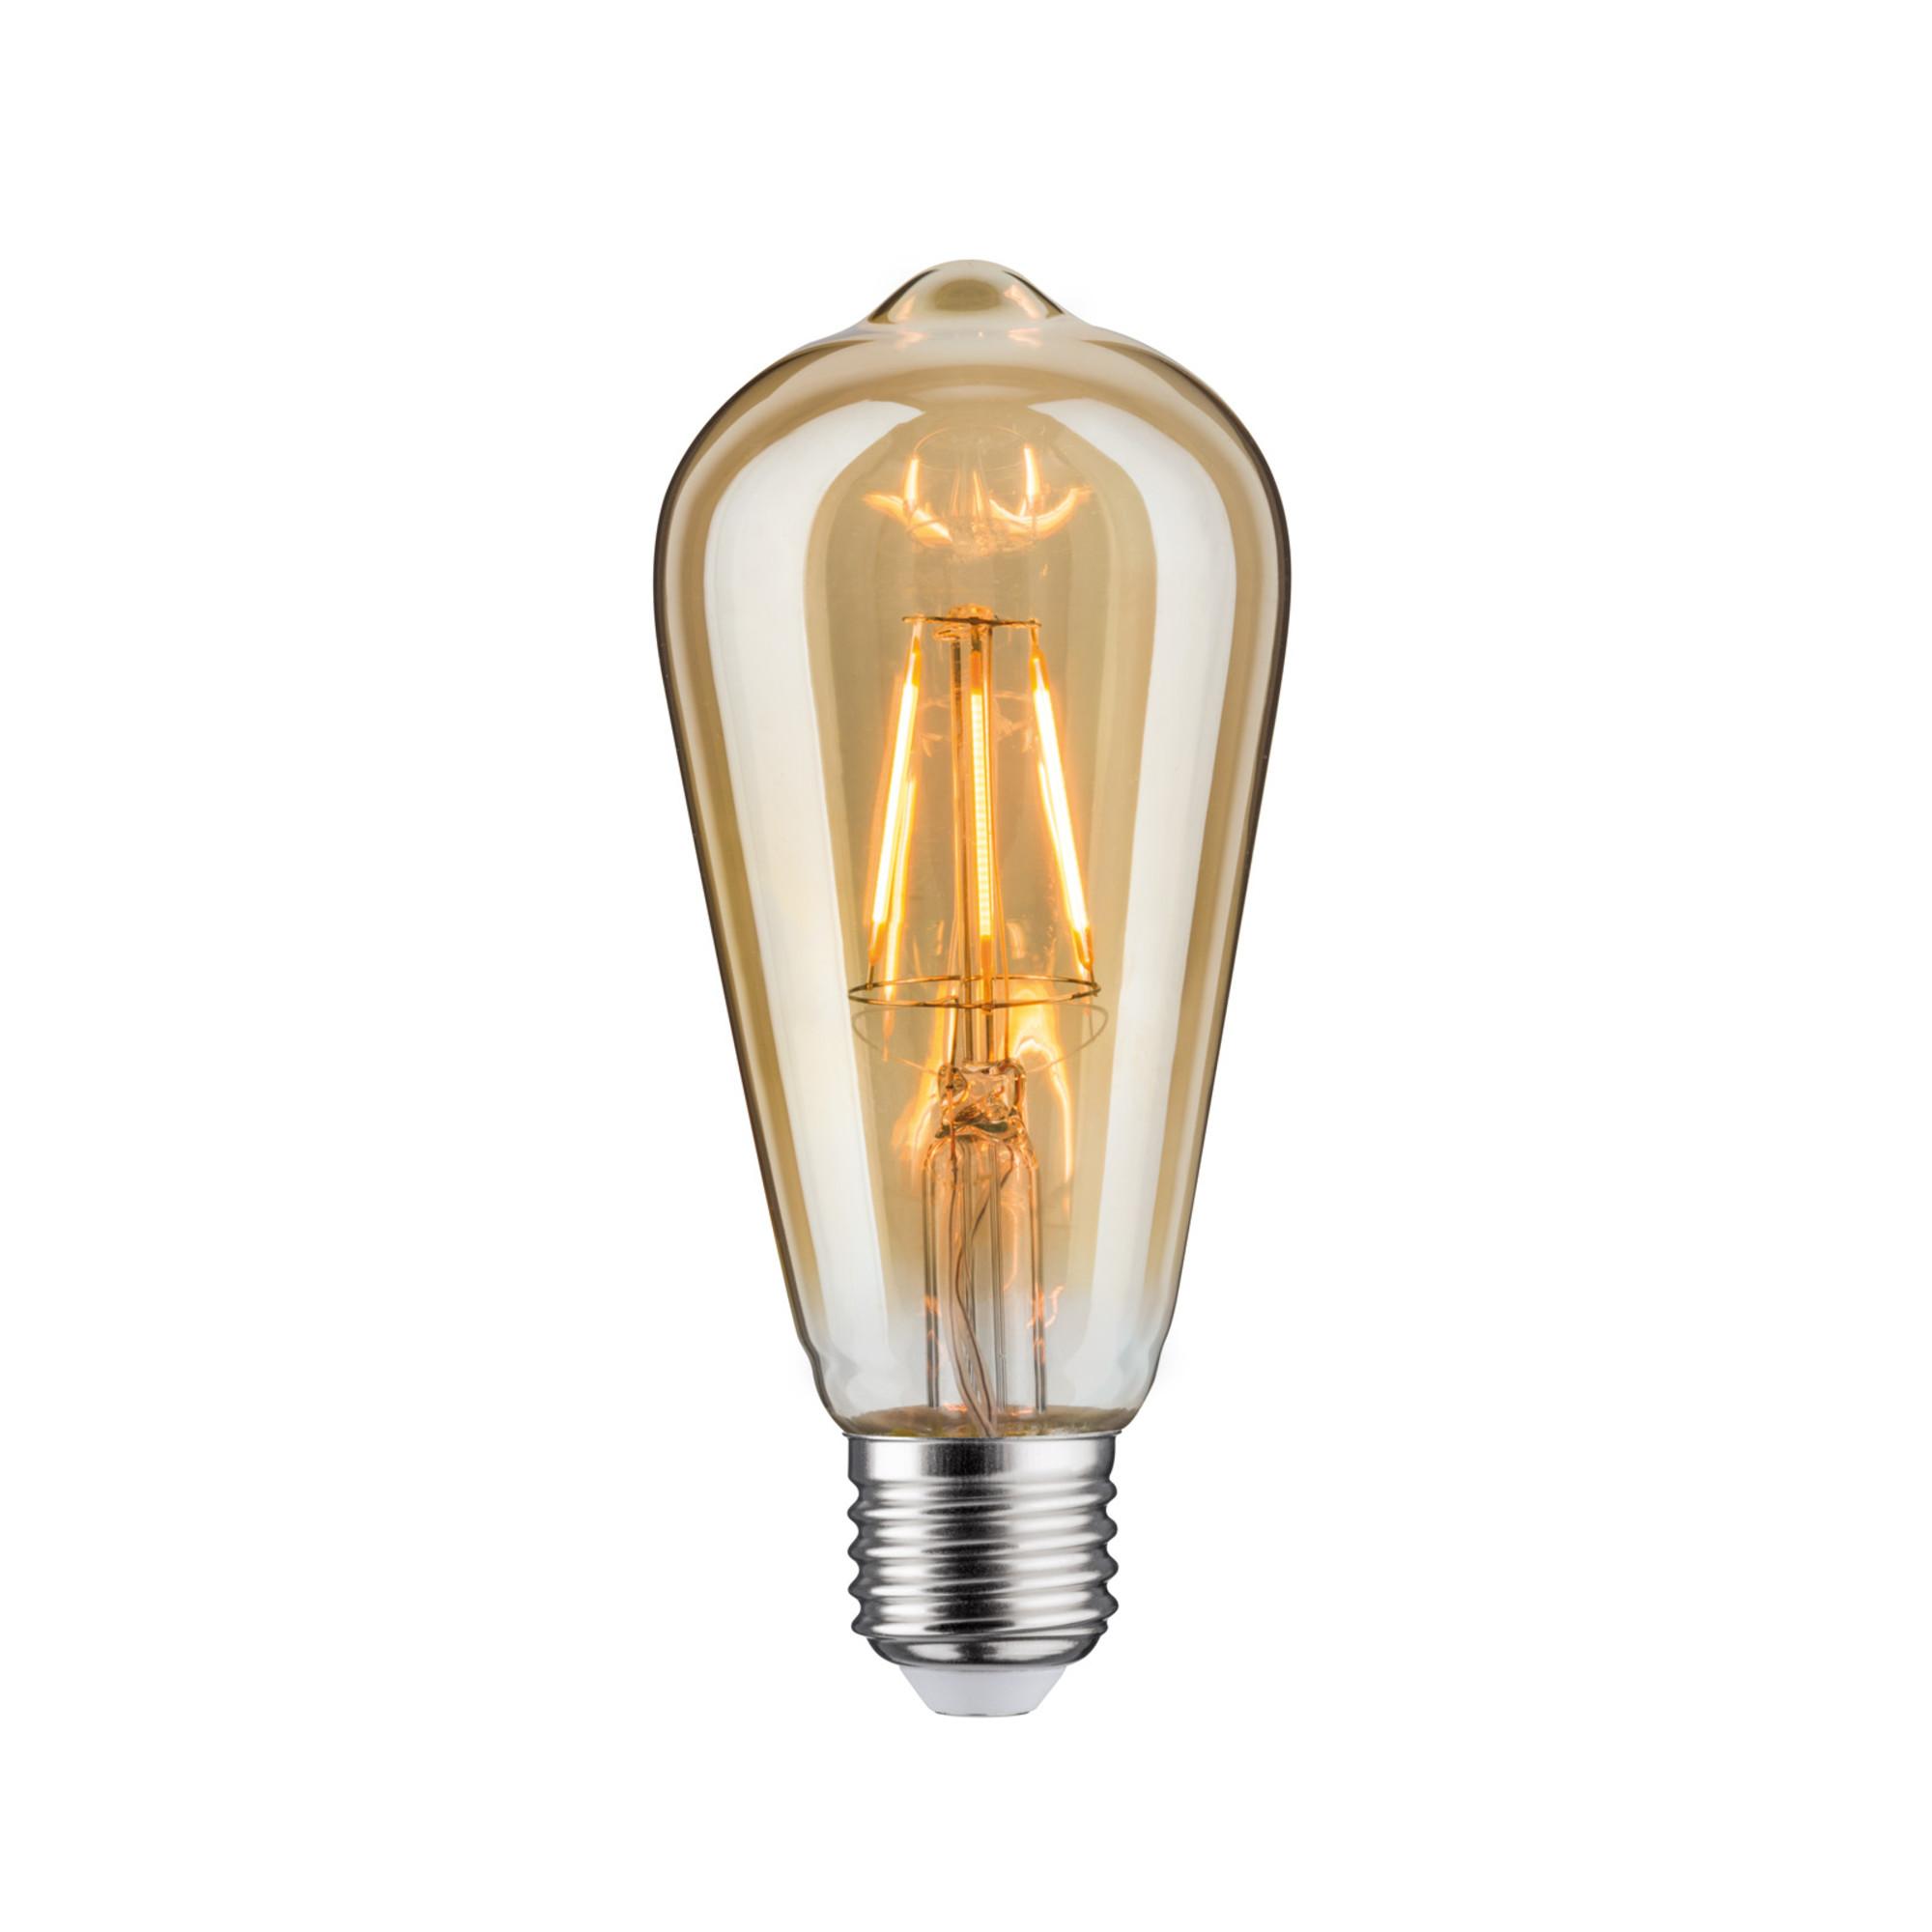 Лампа филаментная Paulmann Vintage ST64 4Вт 250лм 1700К E27 230В Золото 28395.